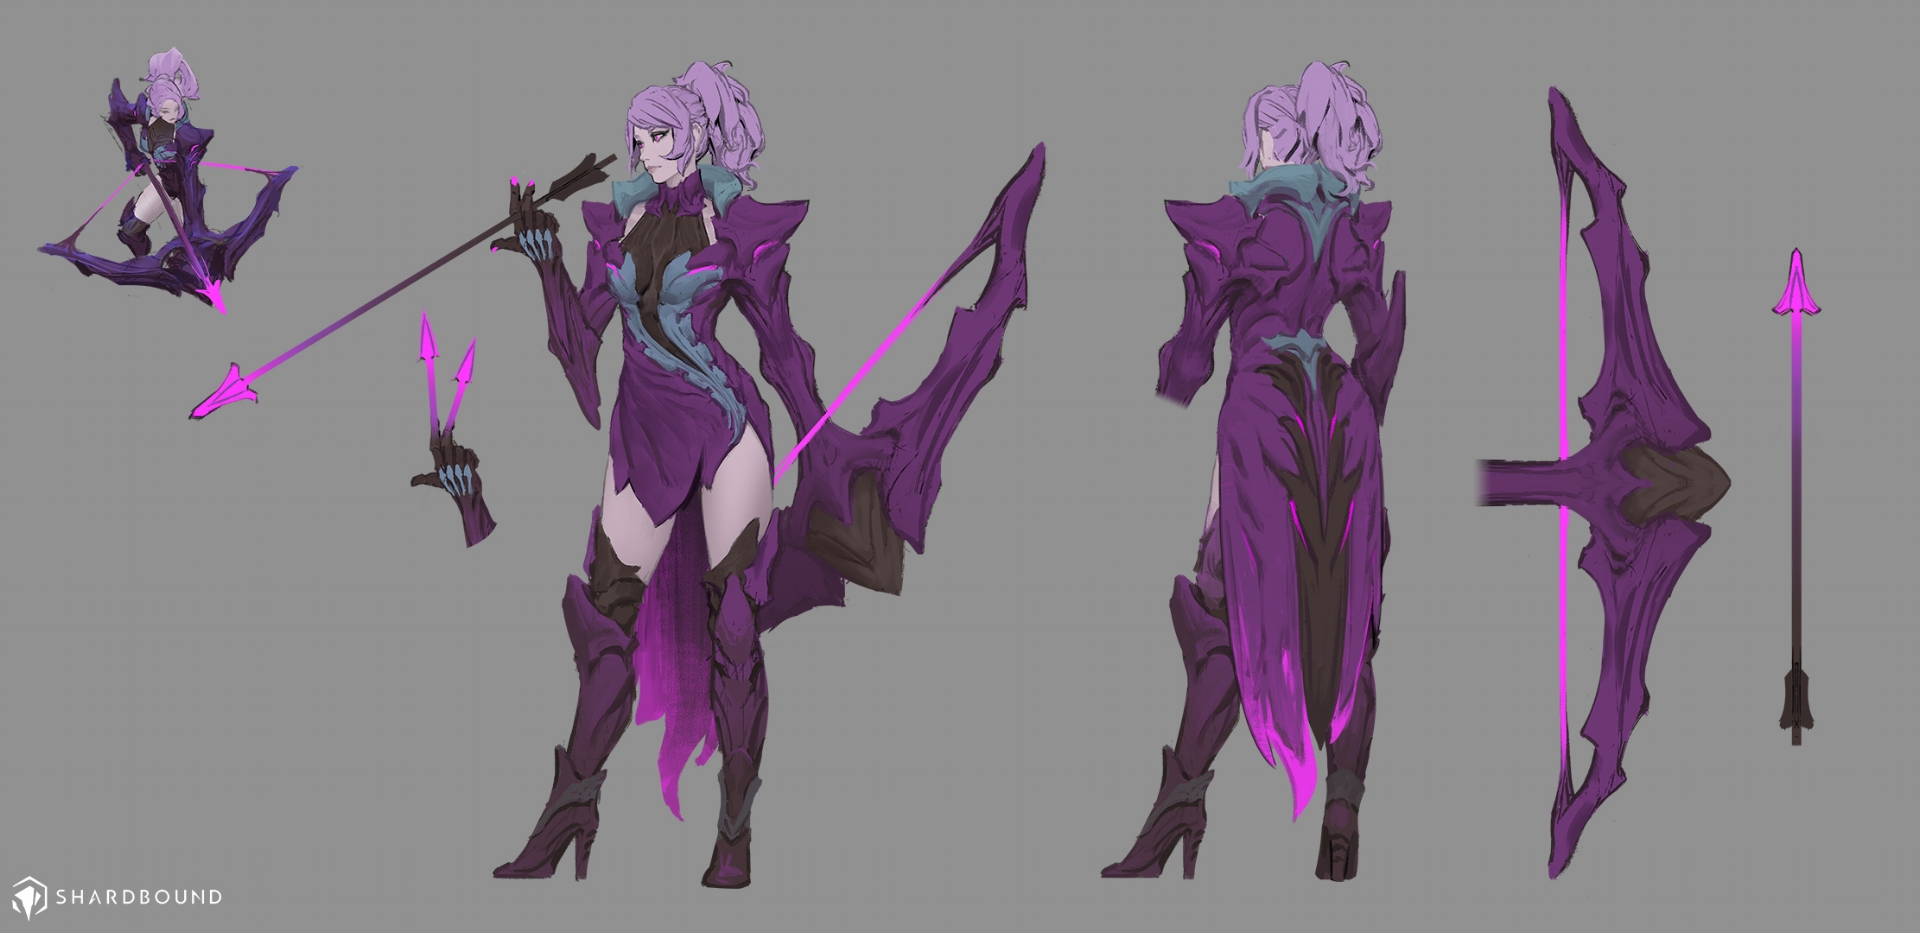 PurpleFaction_Nobles_SoulTakerv2.jpg